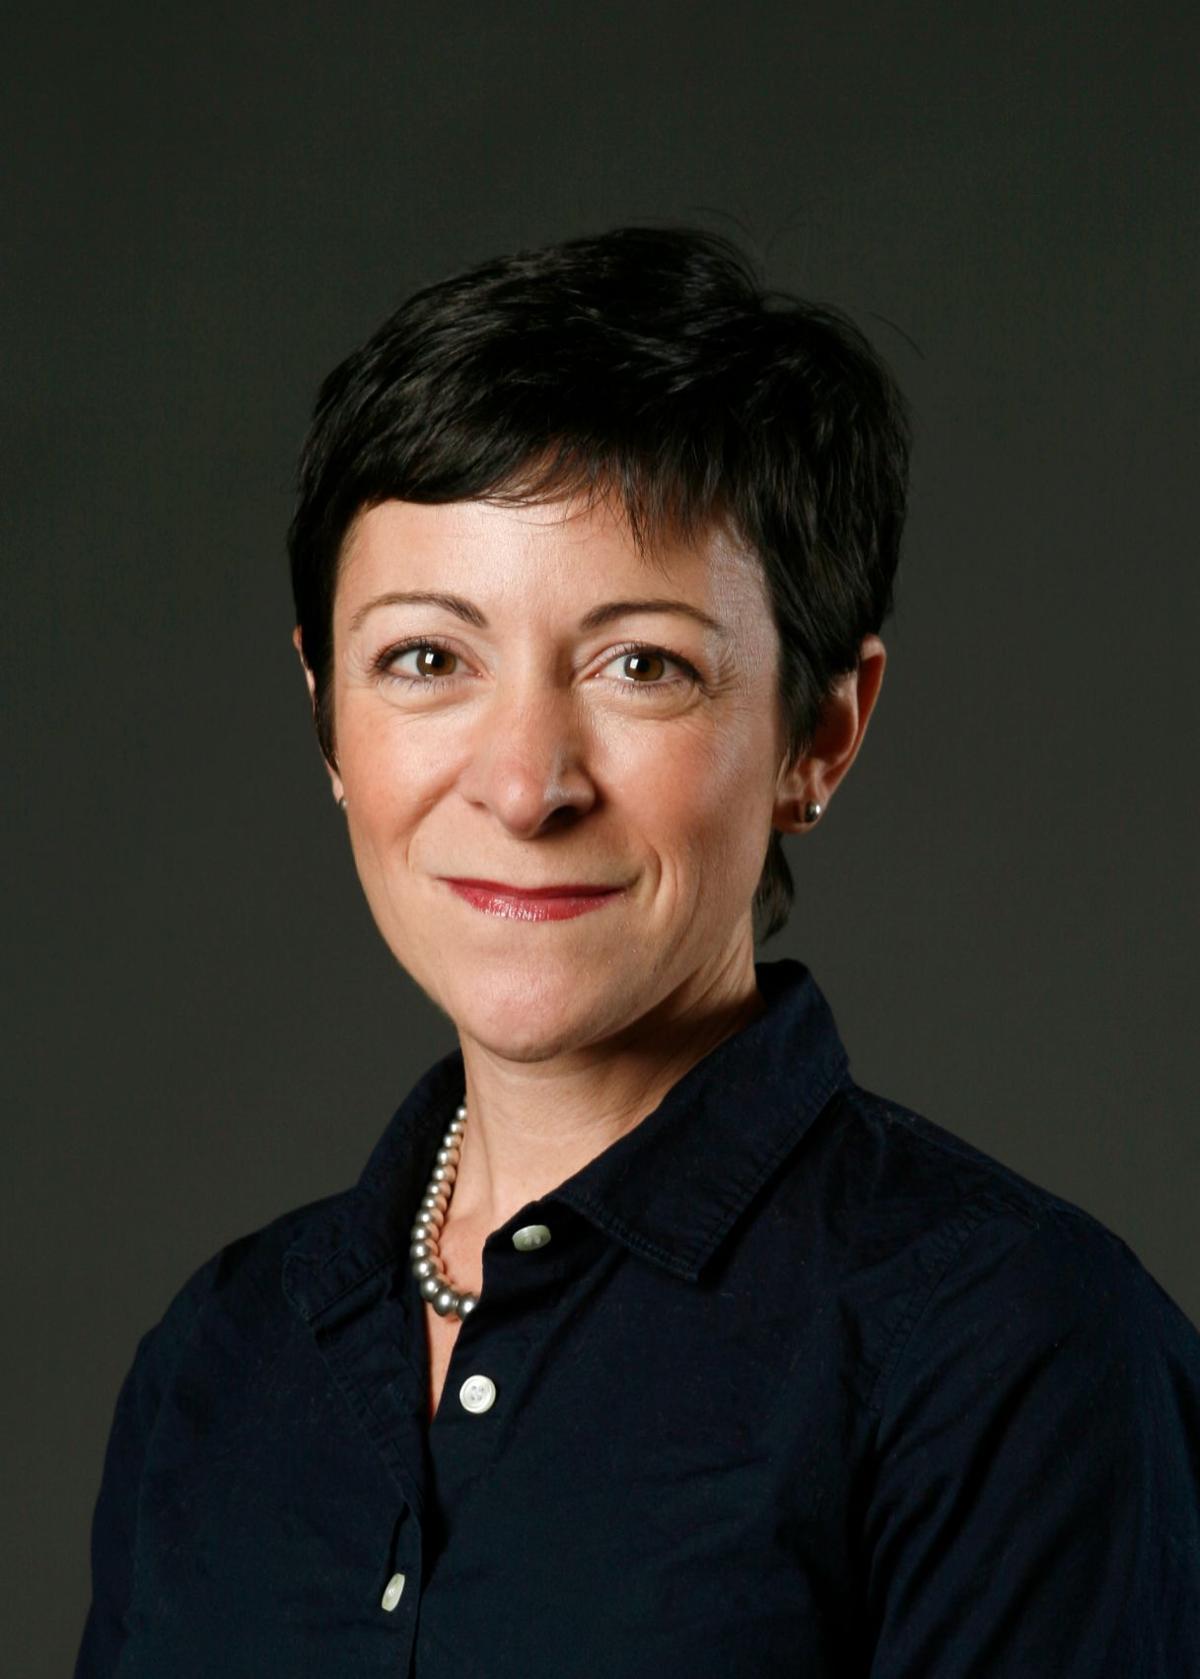 Dr. Melissa Dillmon